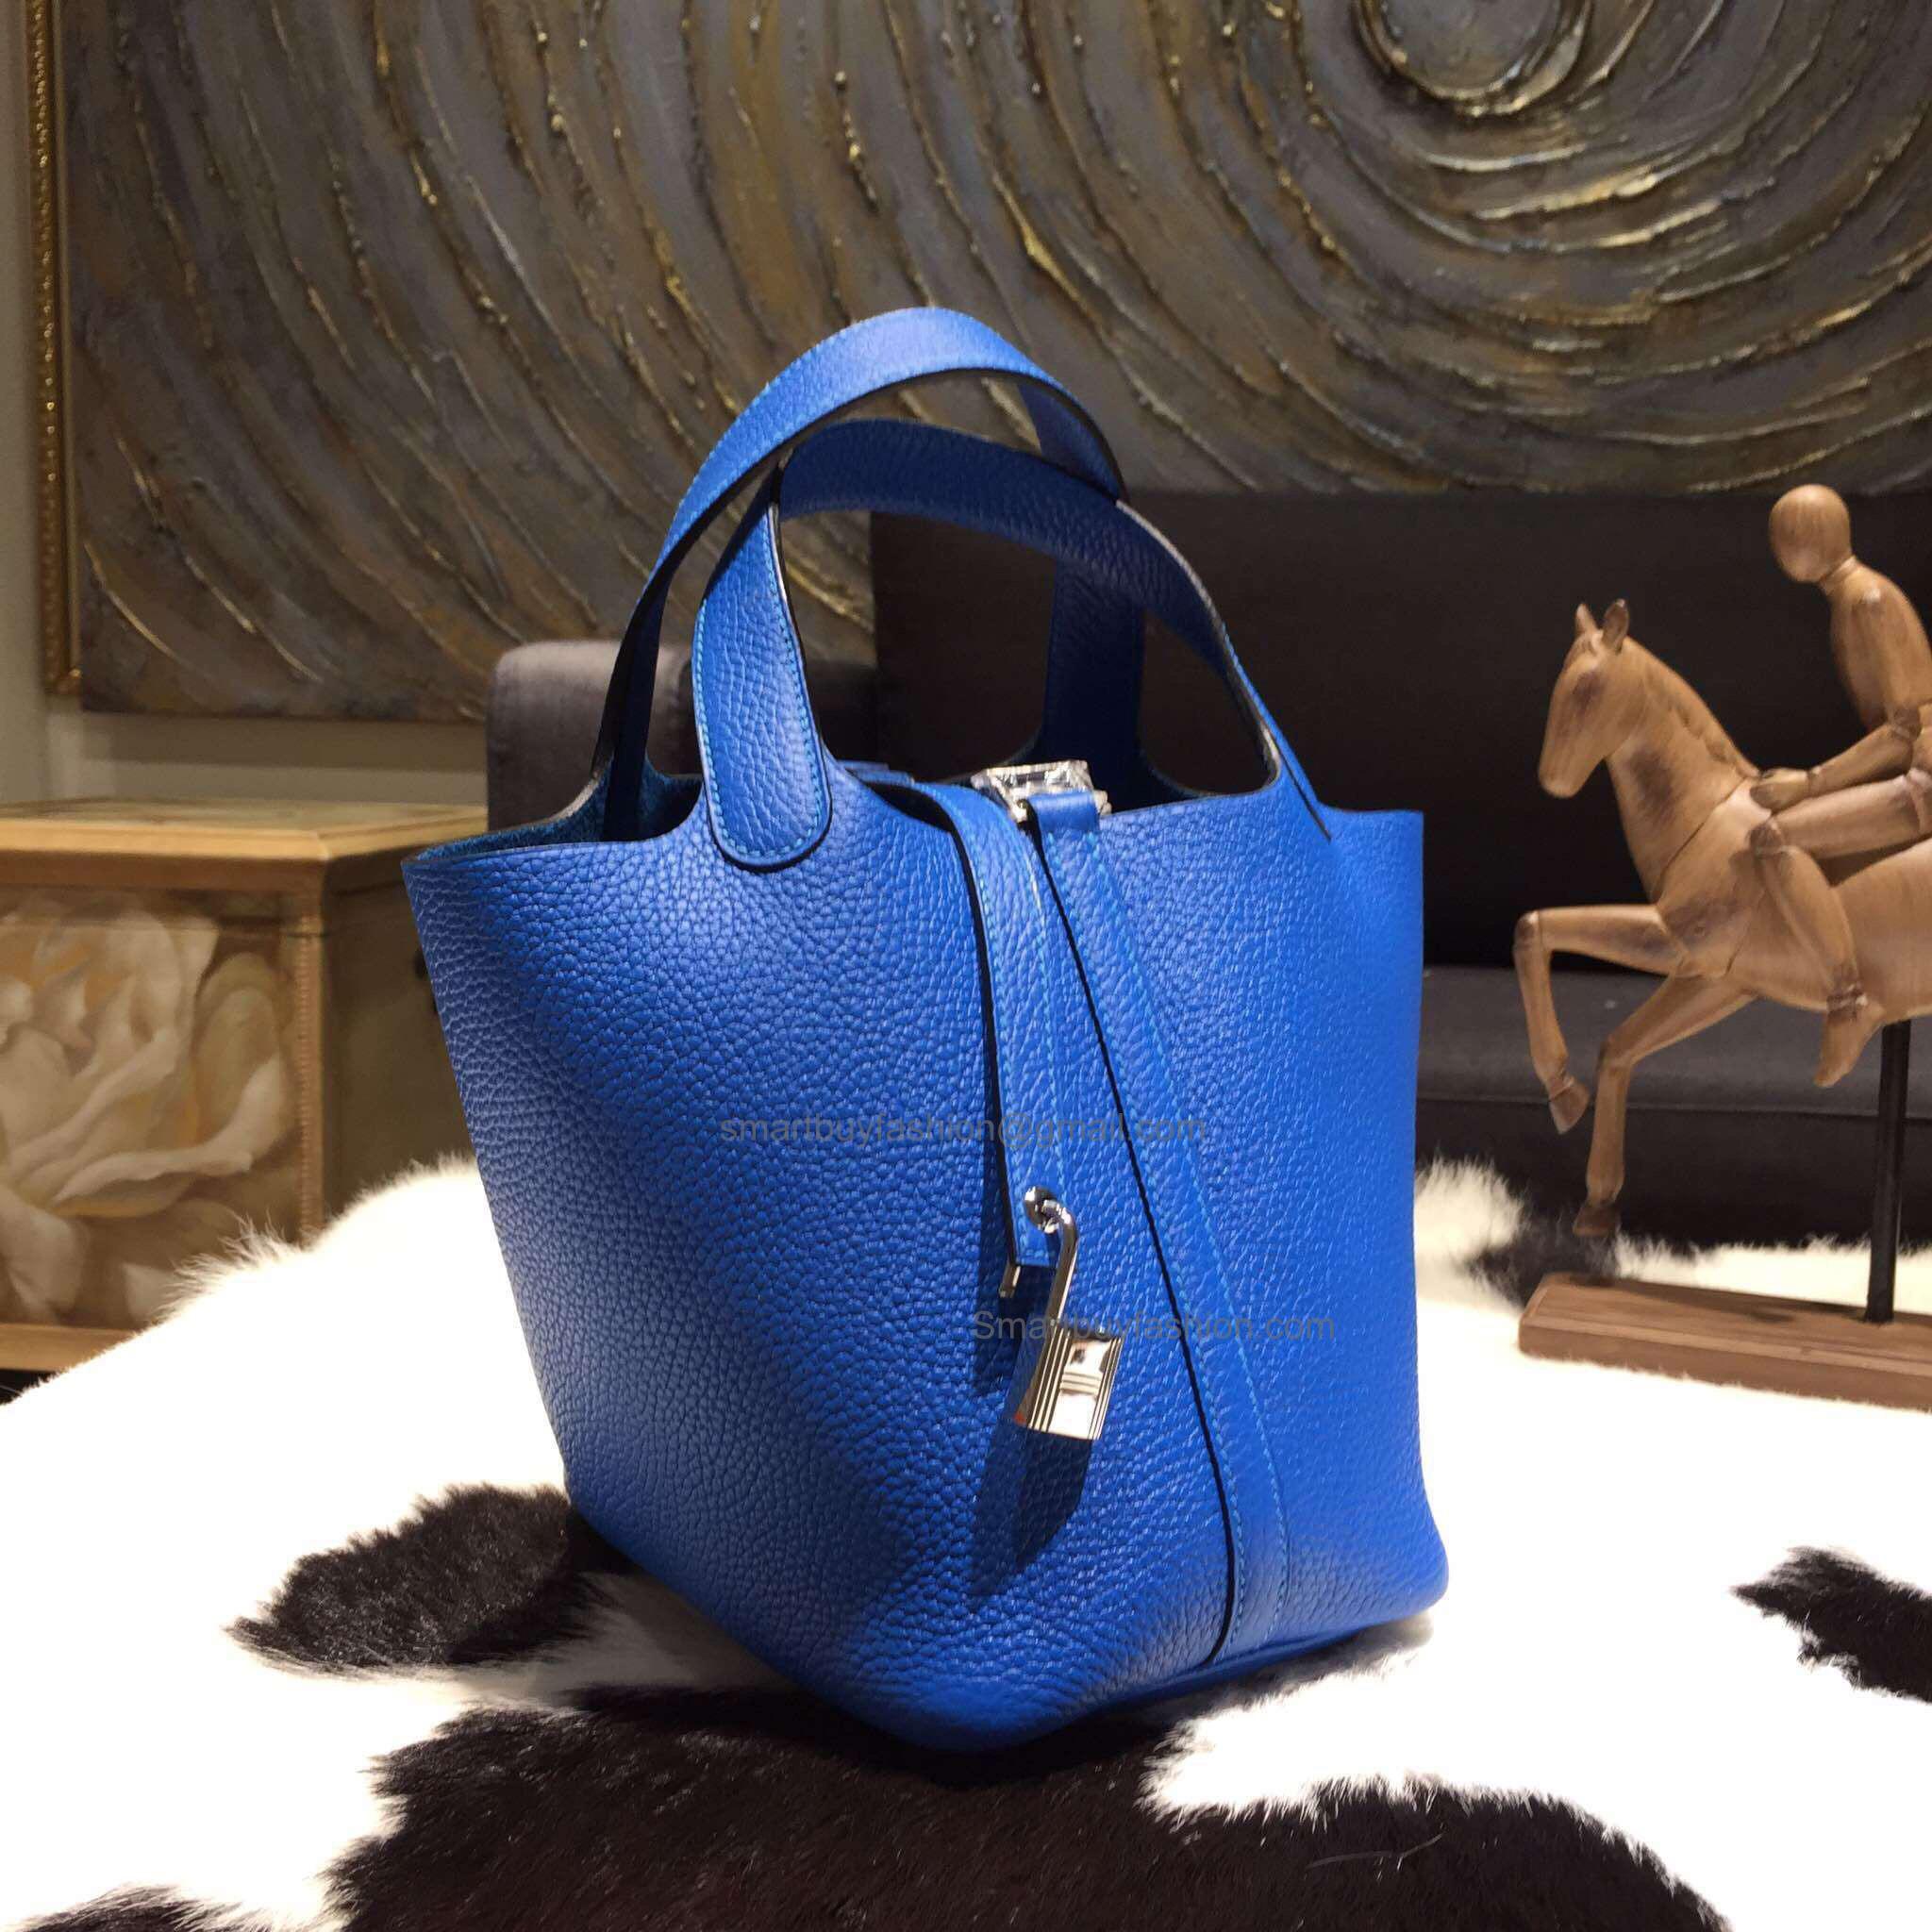 b246ac4d7daa ... good handmade hermes picotin lock 22 tote bag in t7 blue hydra  taurillon clemence 7fb9d 280f2 ...